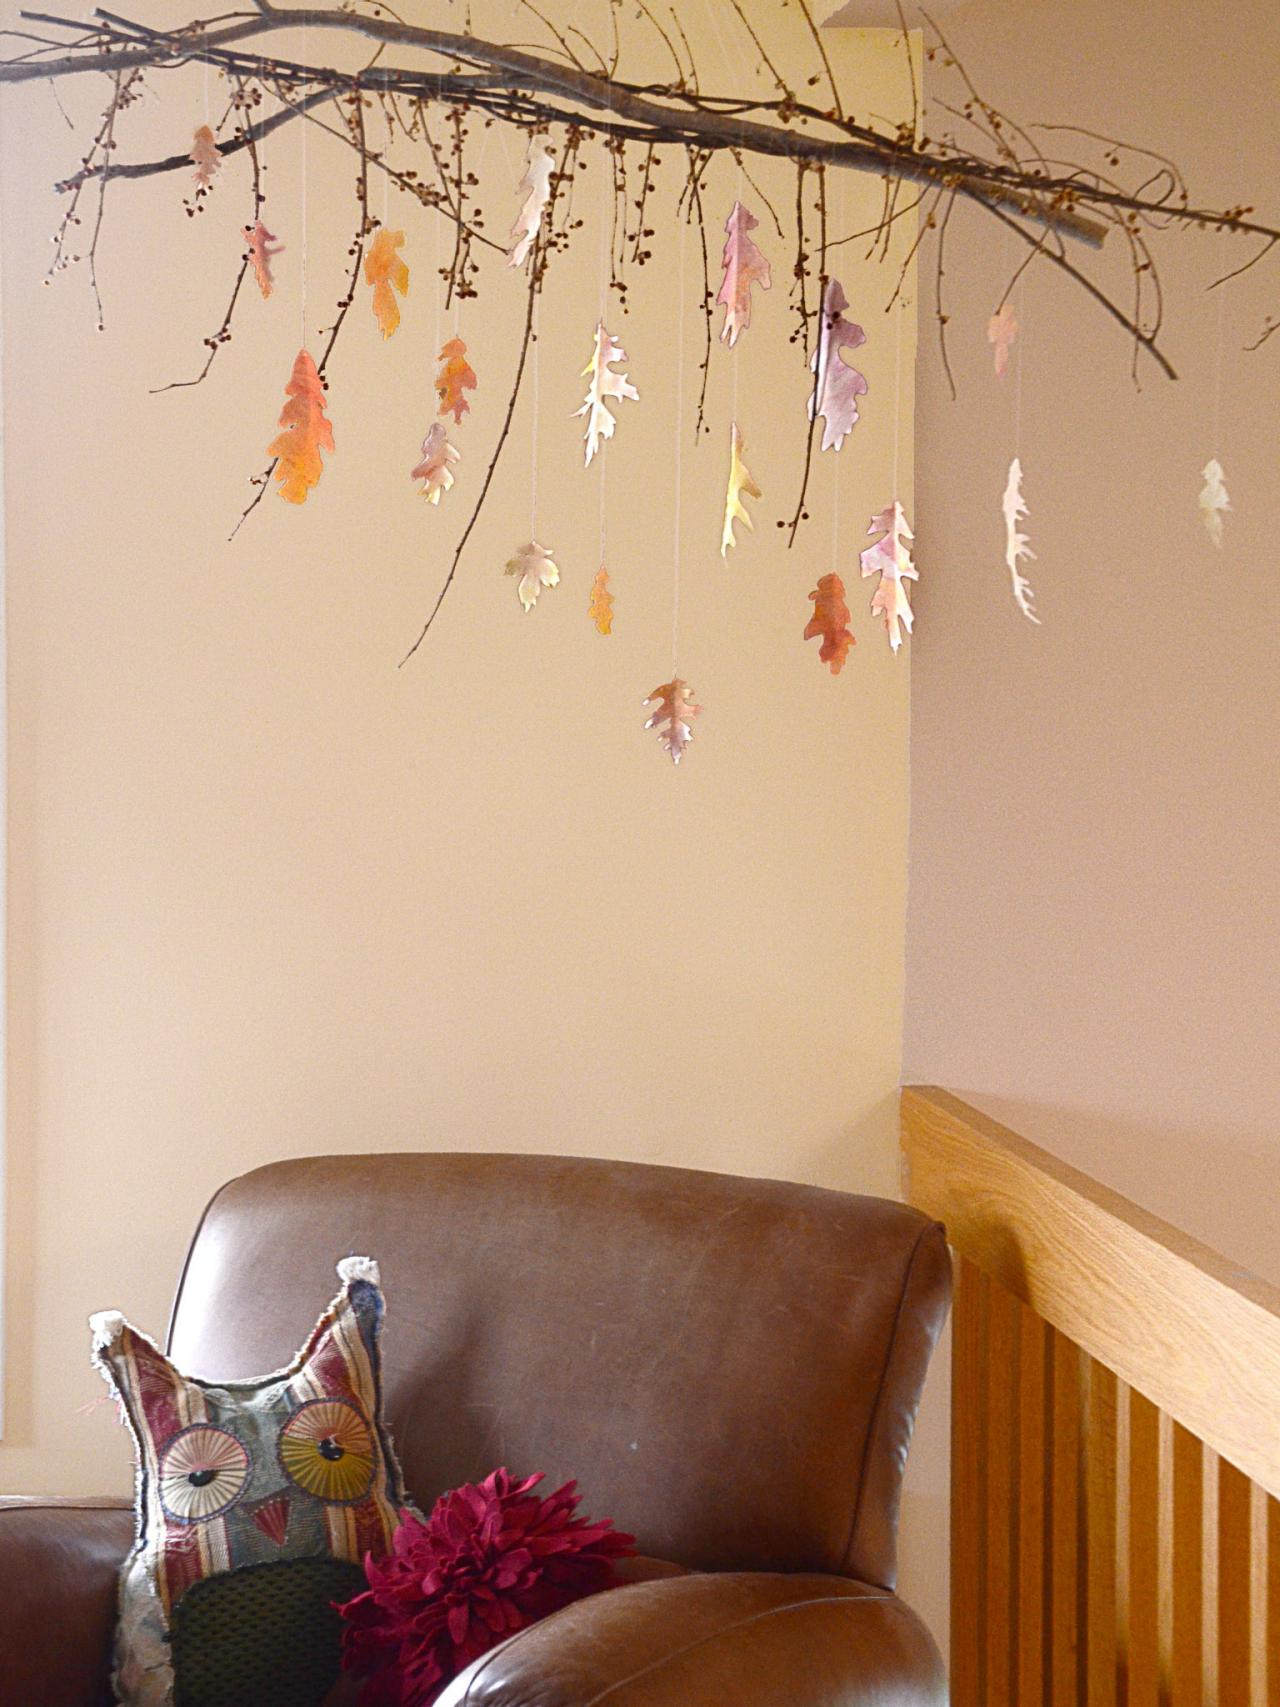 14 Diy Fall Decorating Ideas Hgtv S Decorating Design Blog Hgtv